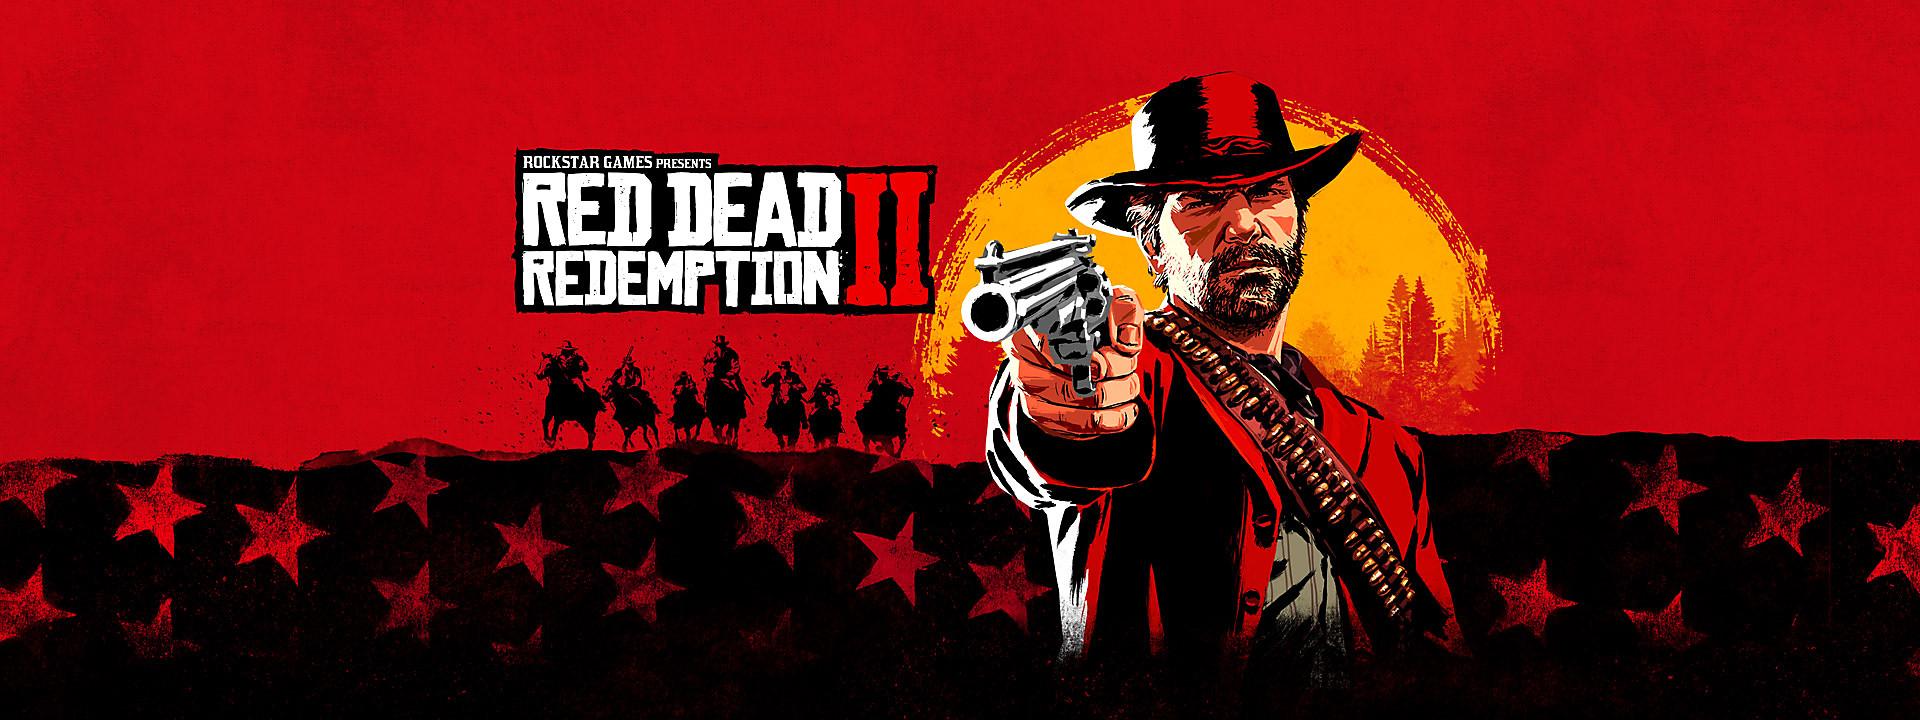 بازی Red Dead Redemption 2 مخصوص PS4